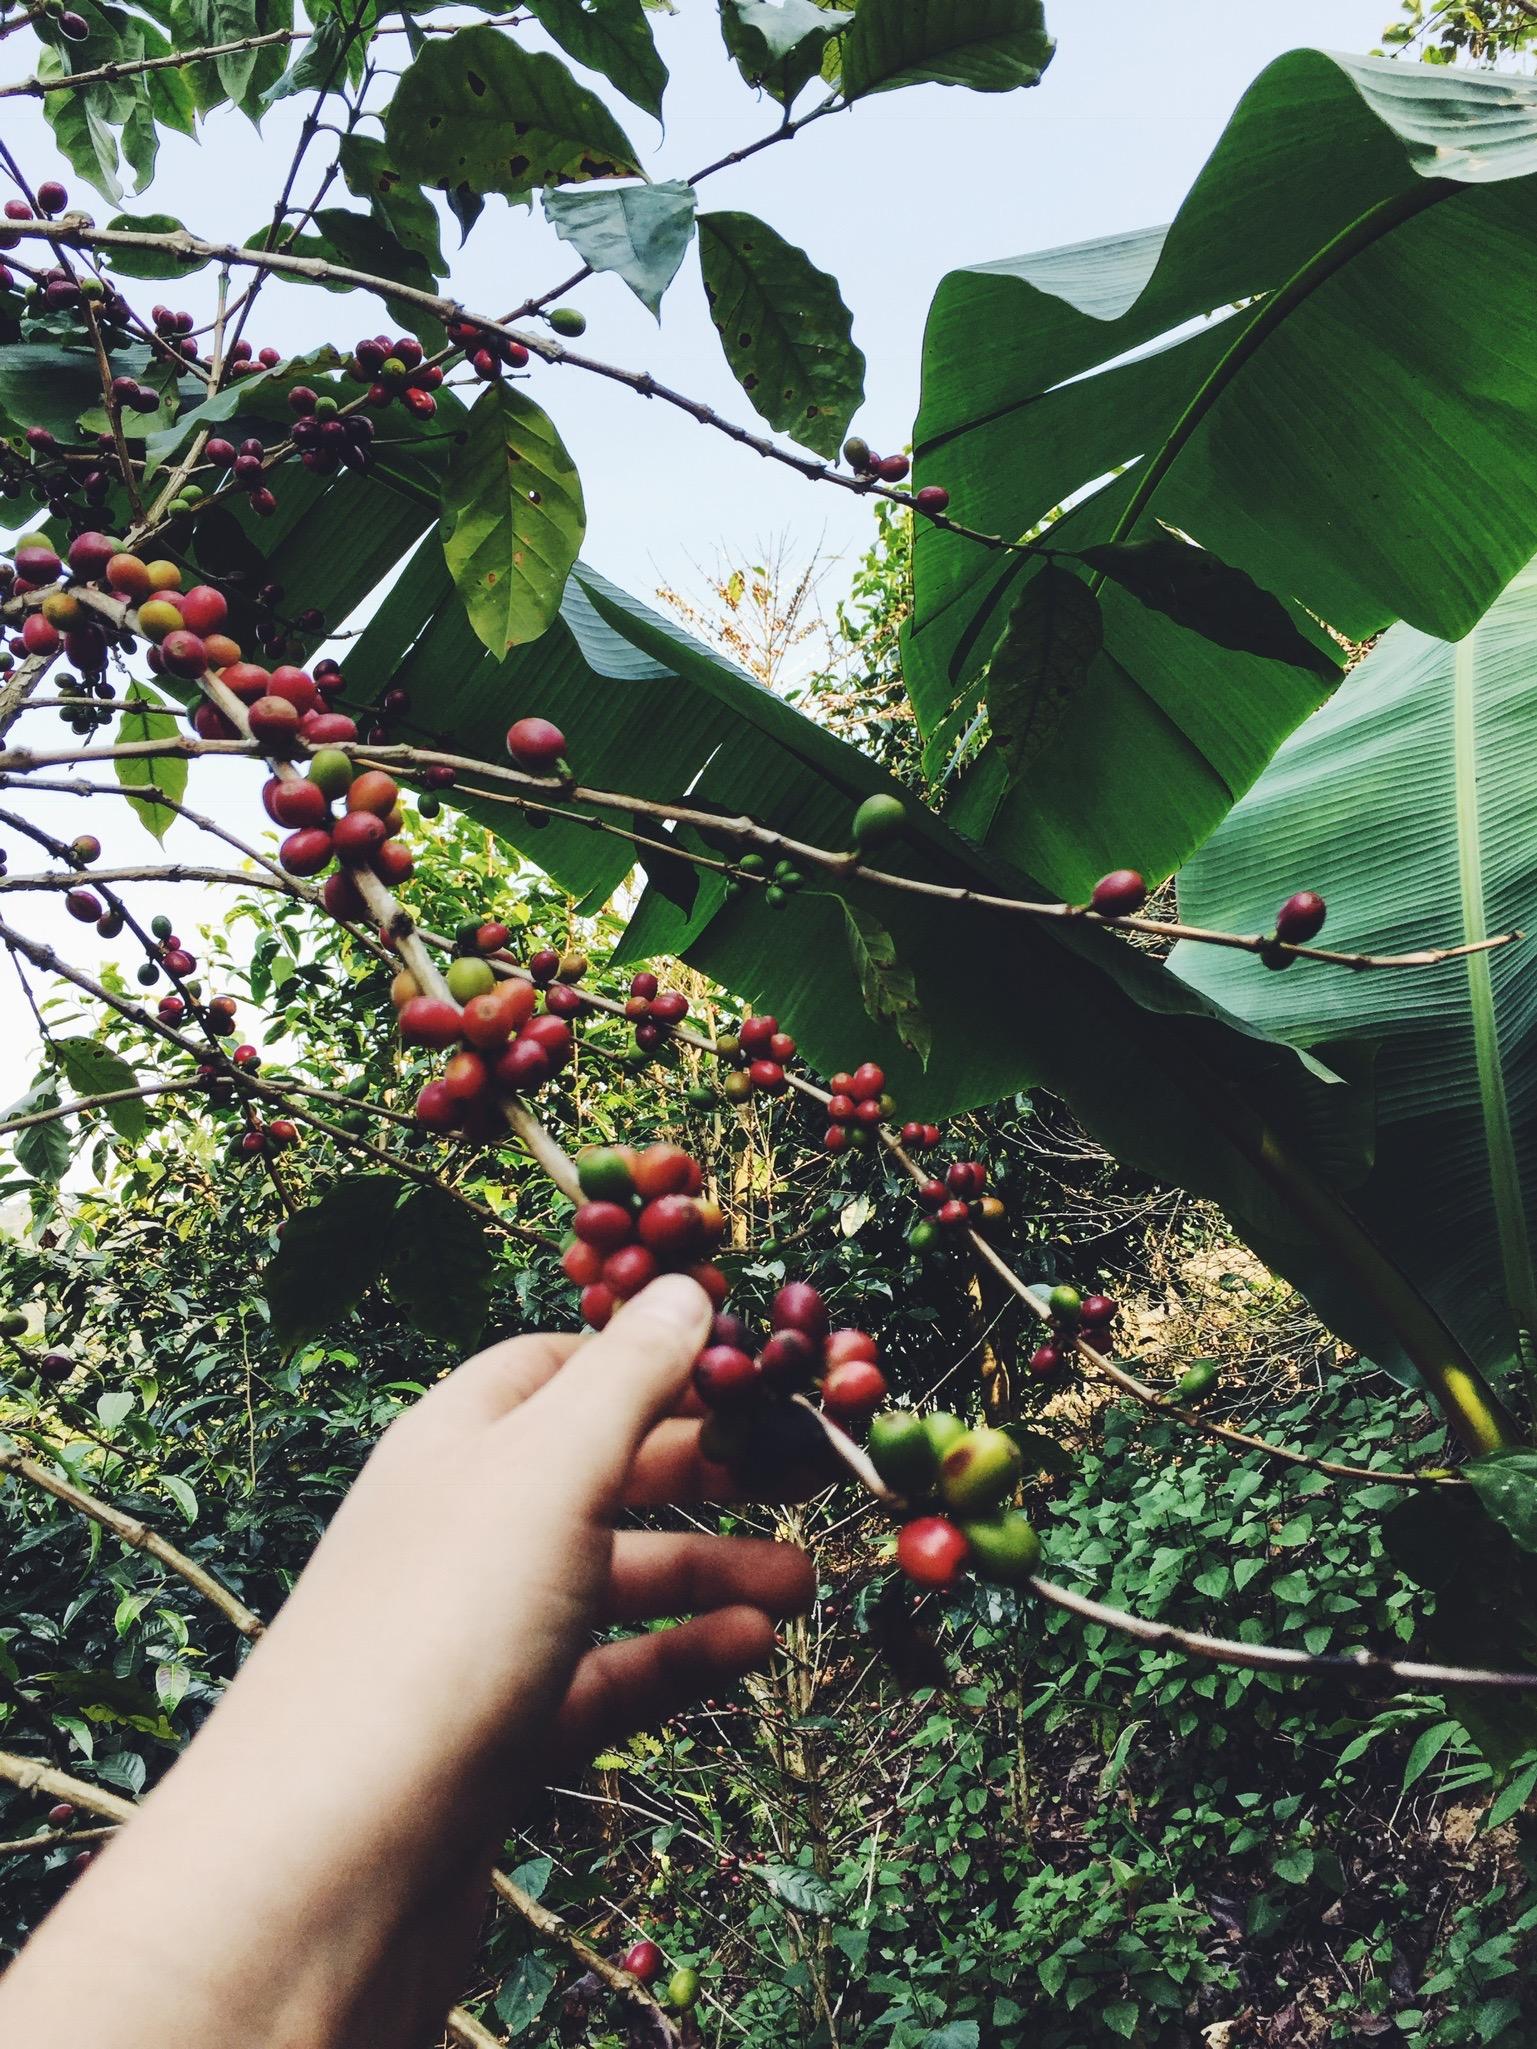 Picking coffee cherries on Lee's farm.